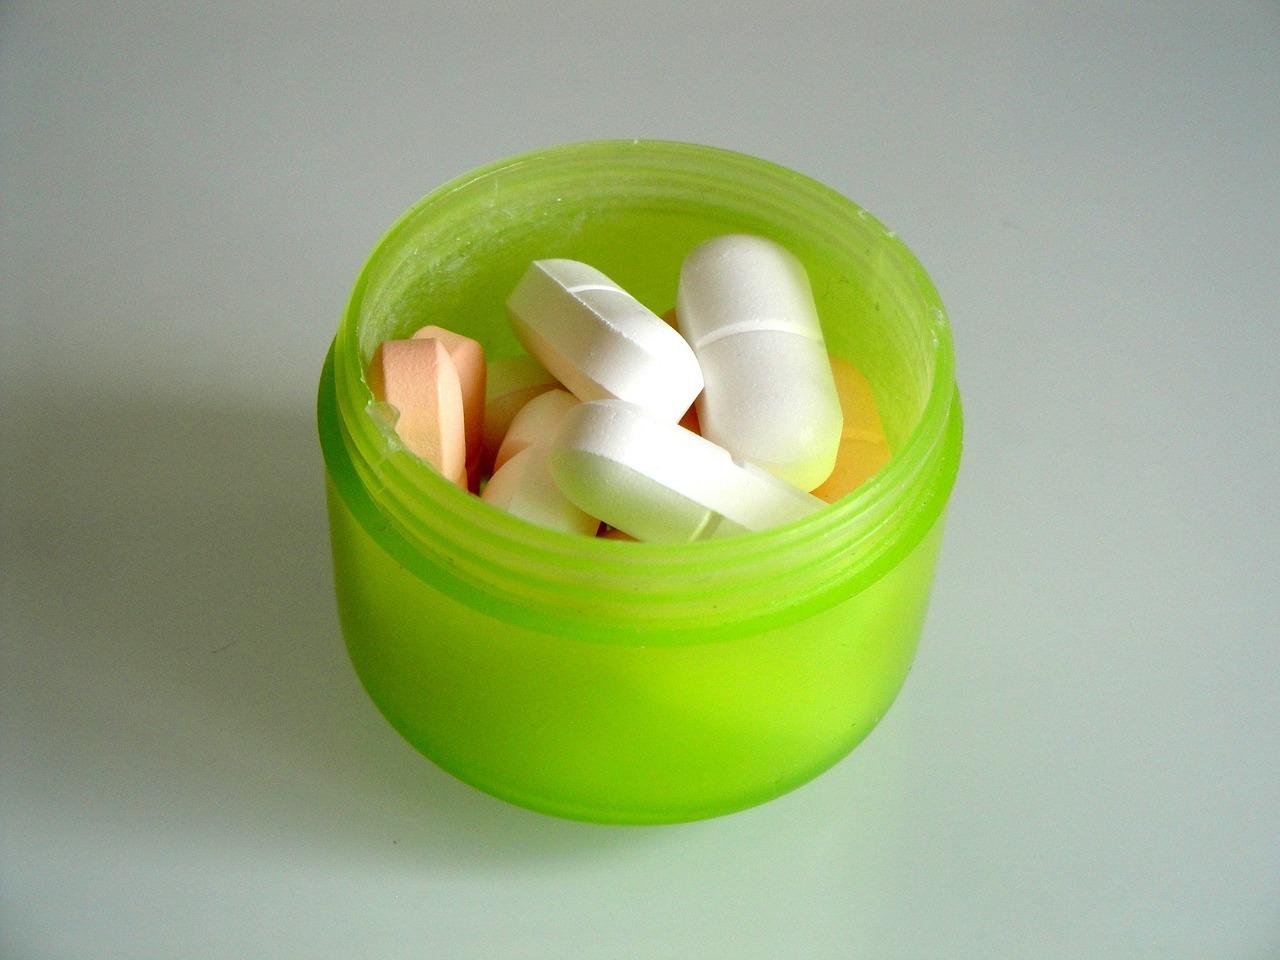 Prescription Sleeping Pills - Benzodiazepines